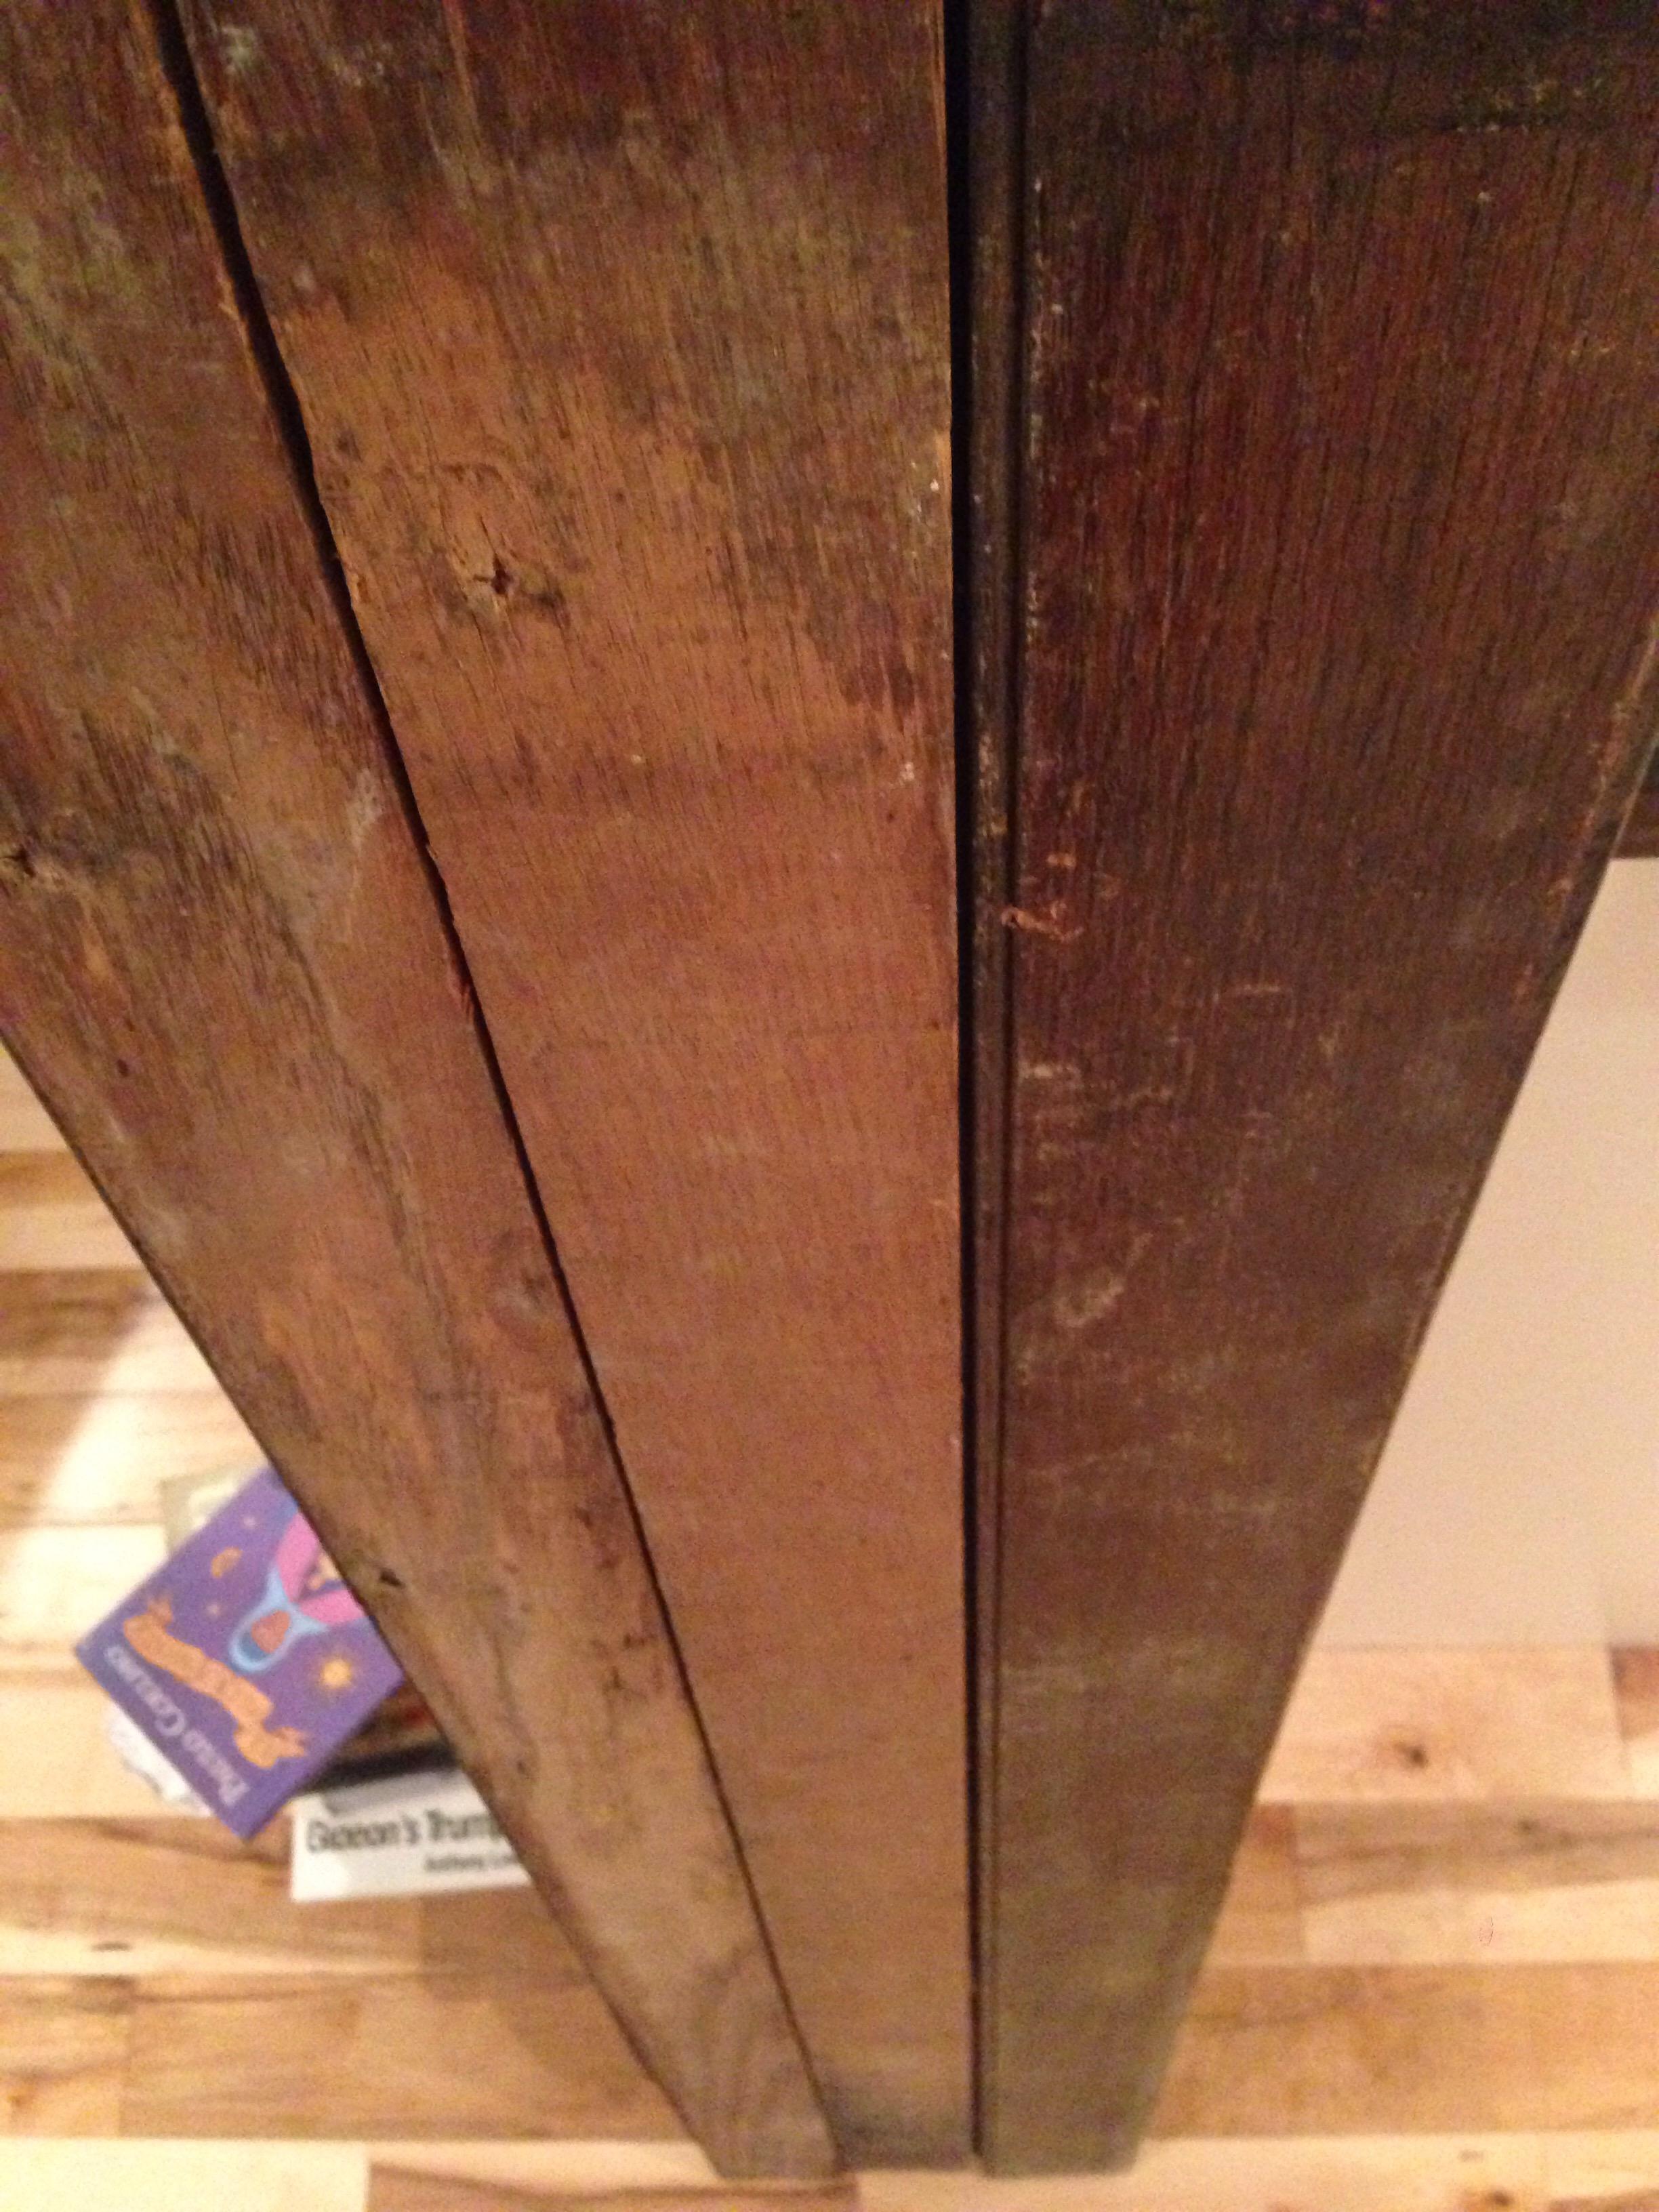 100 expensive bookshelves diwyatt from rickety railing to b